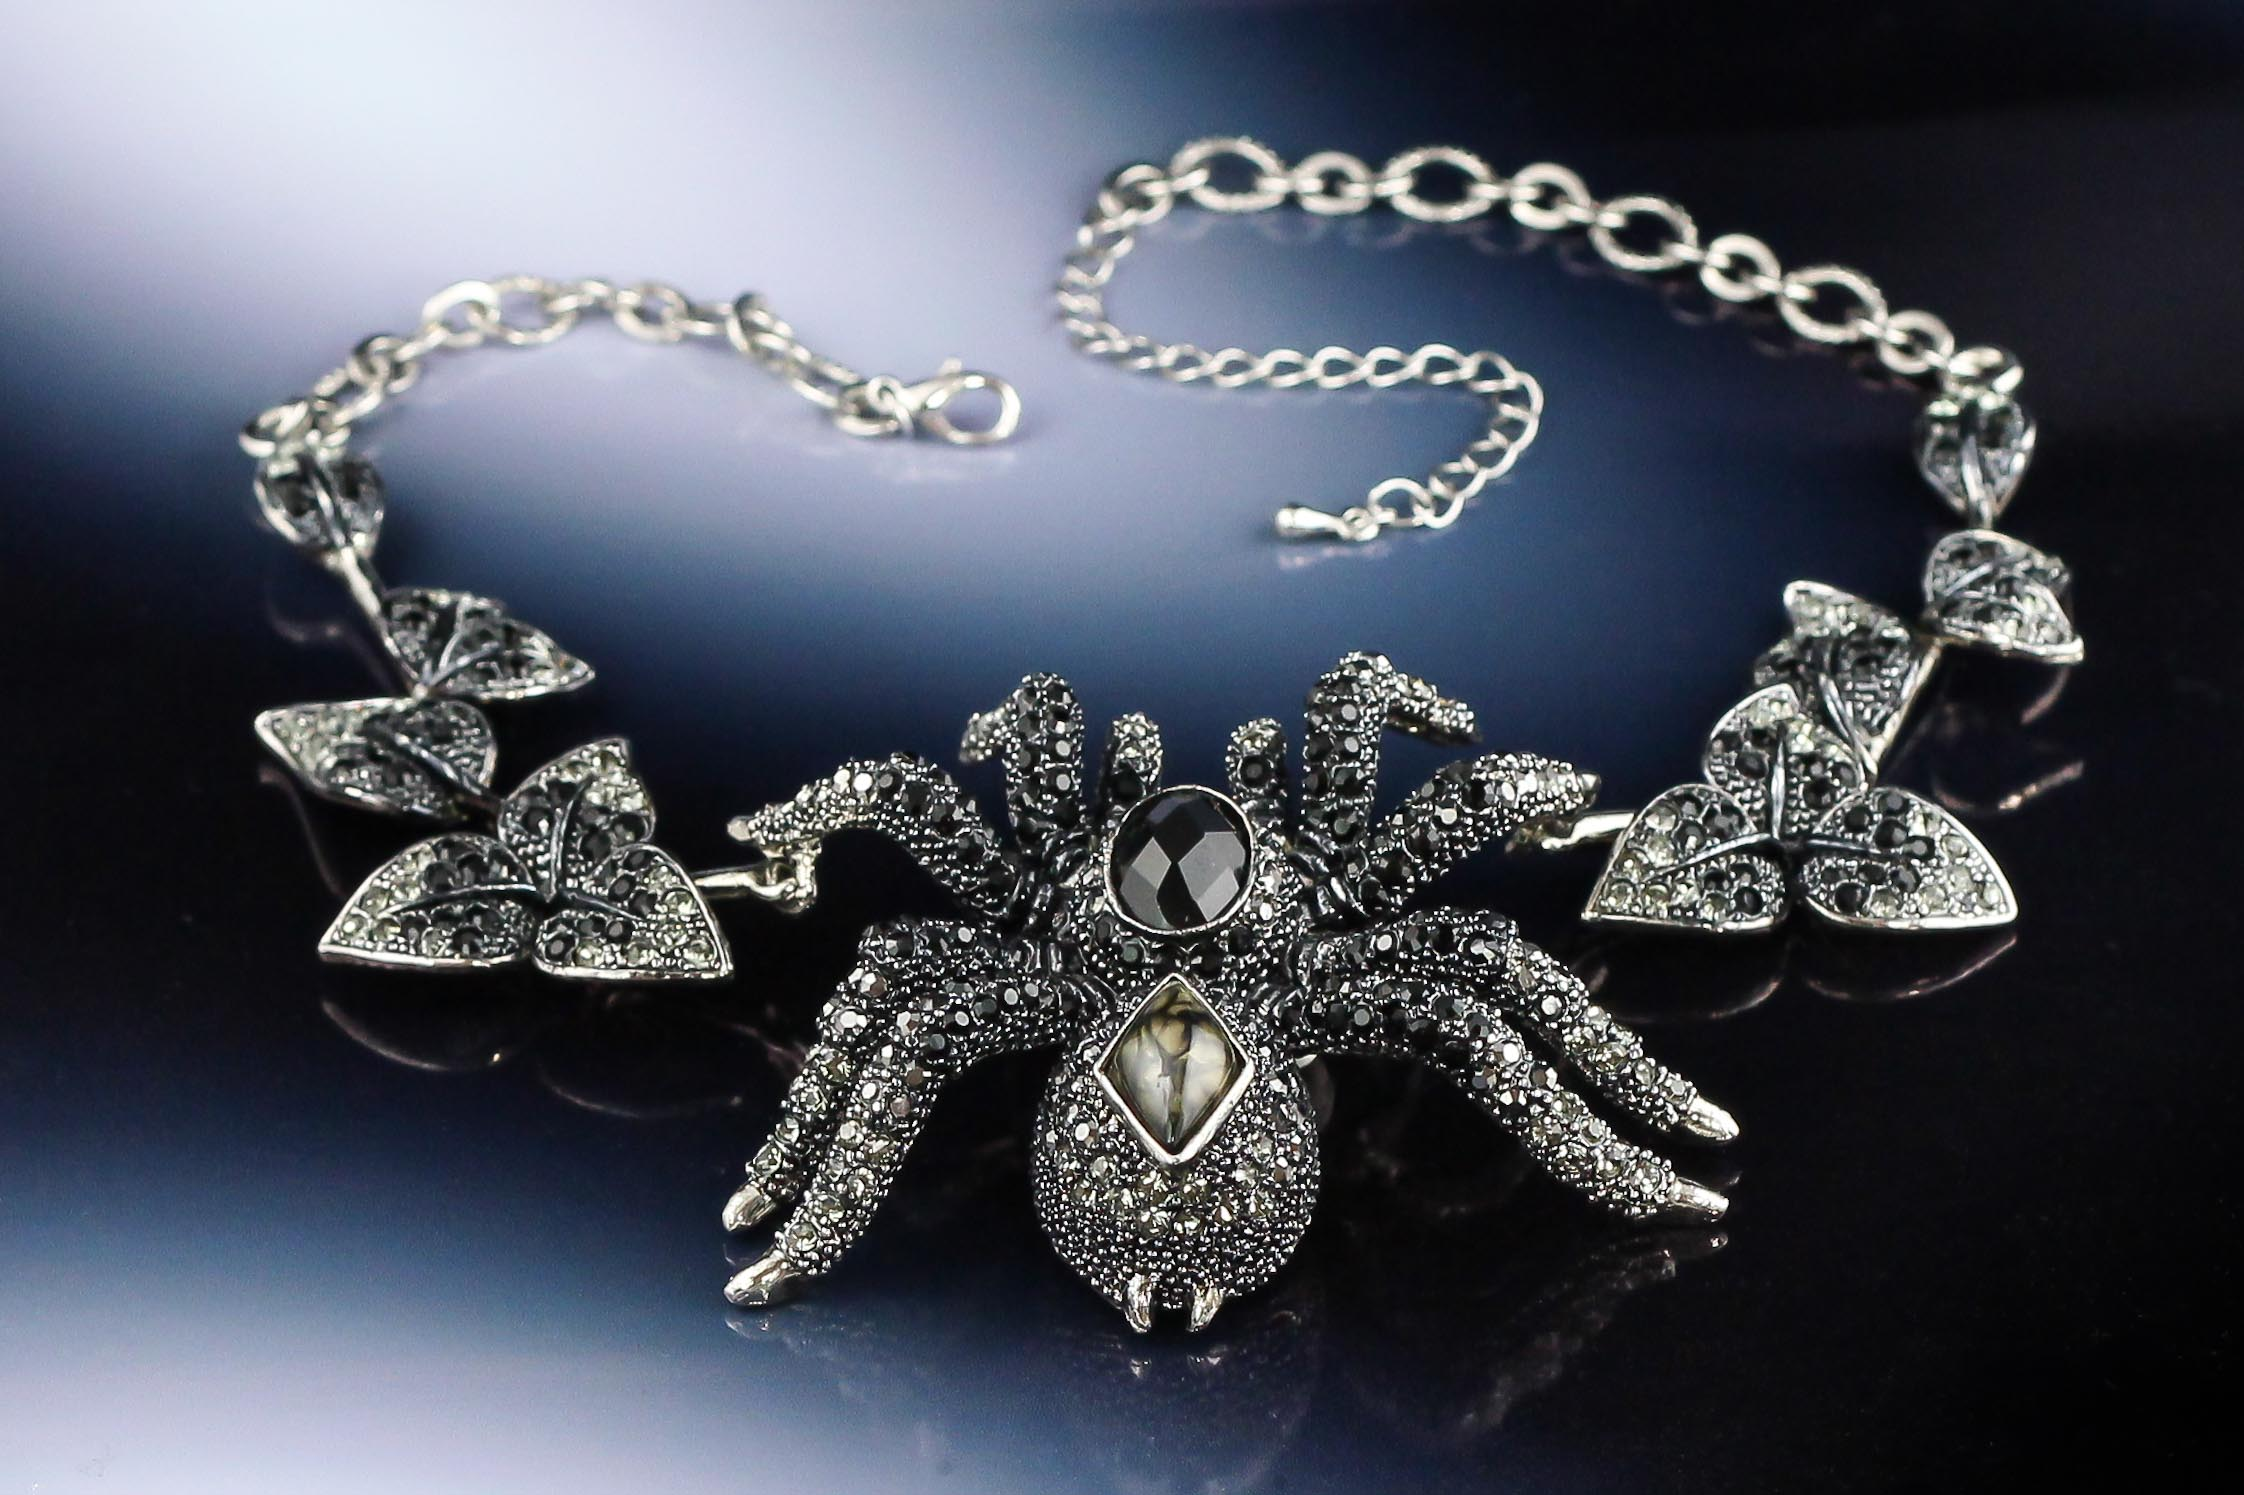 Crystal-spider-gothic-necklace.jpg